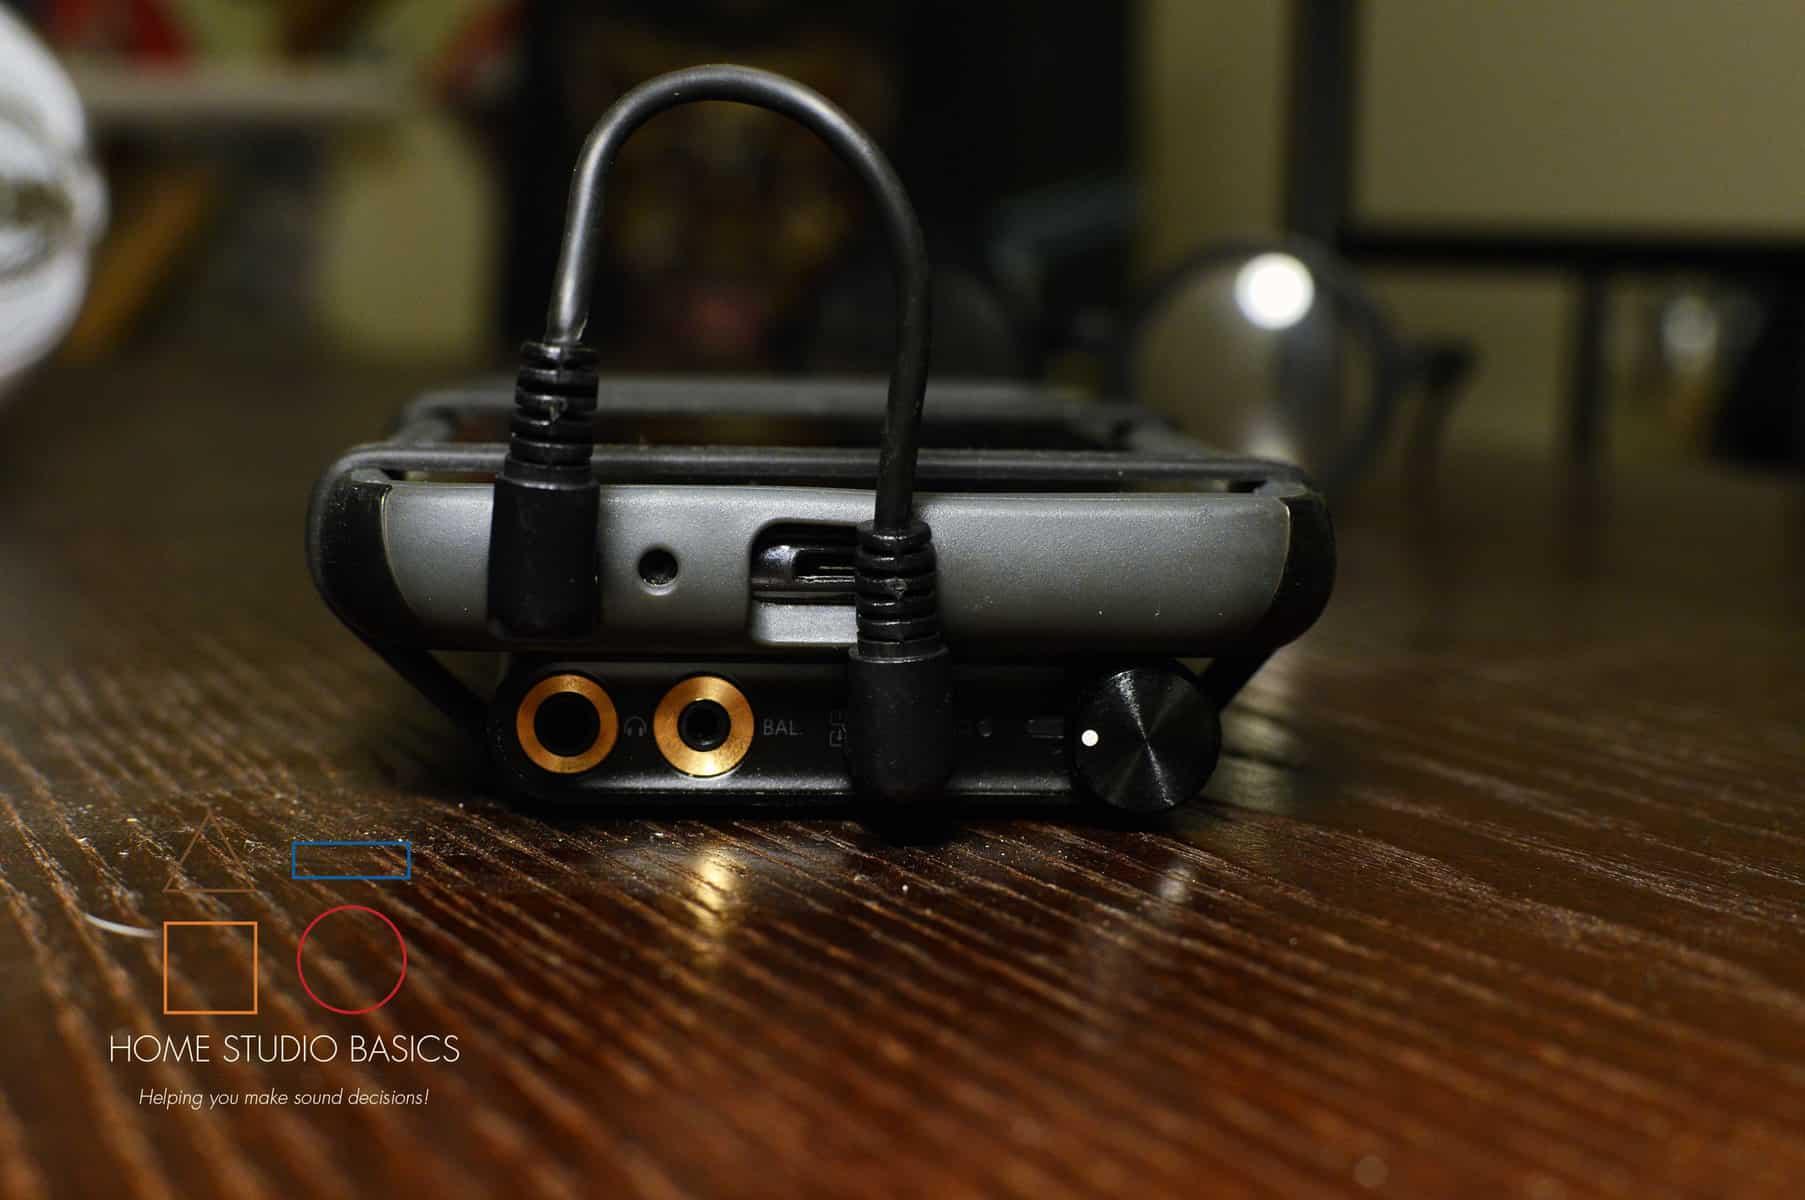 FiiO Q1 MK II Review